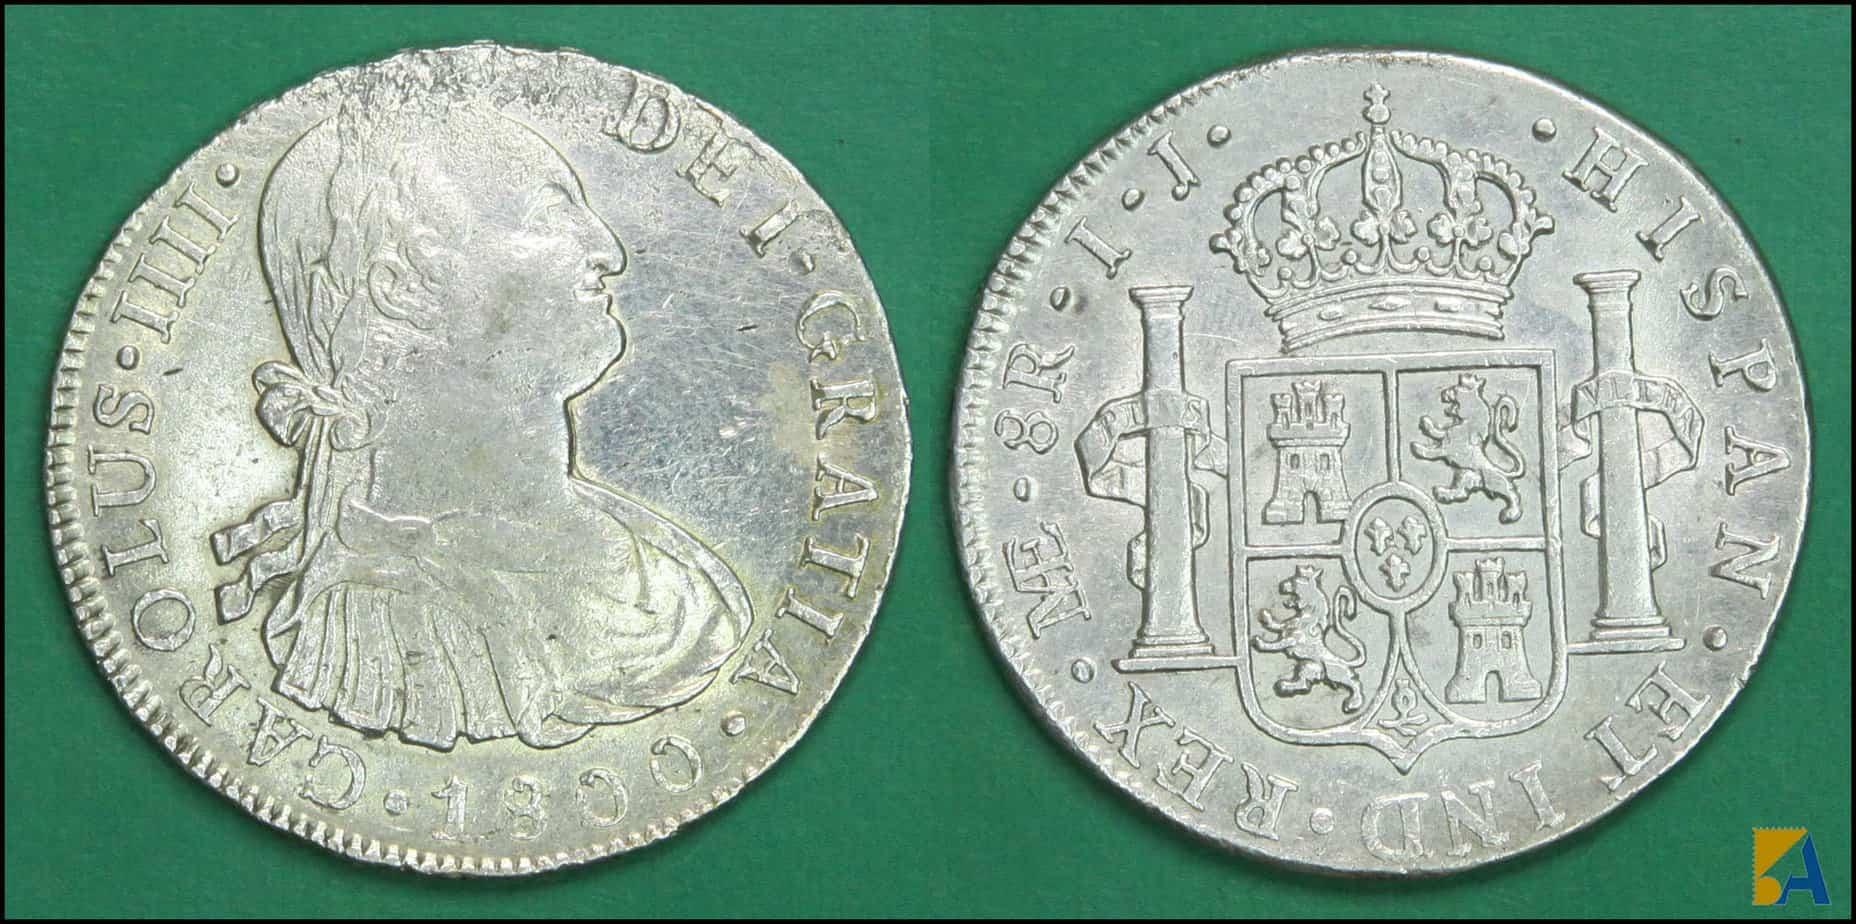 8 reales de Lima, 1800